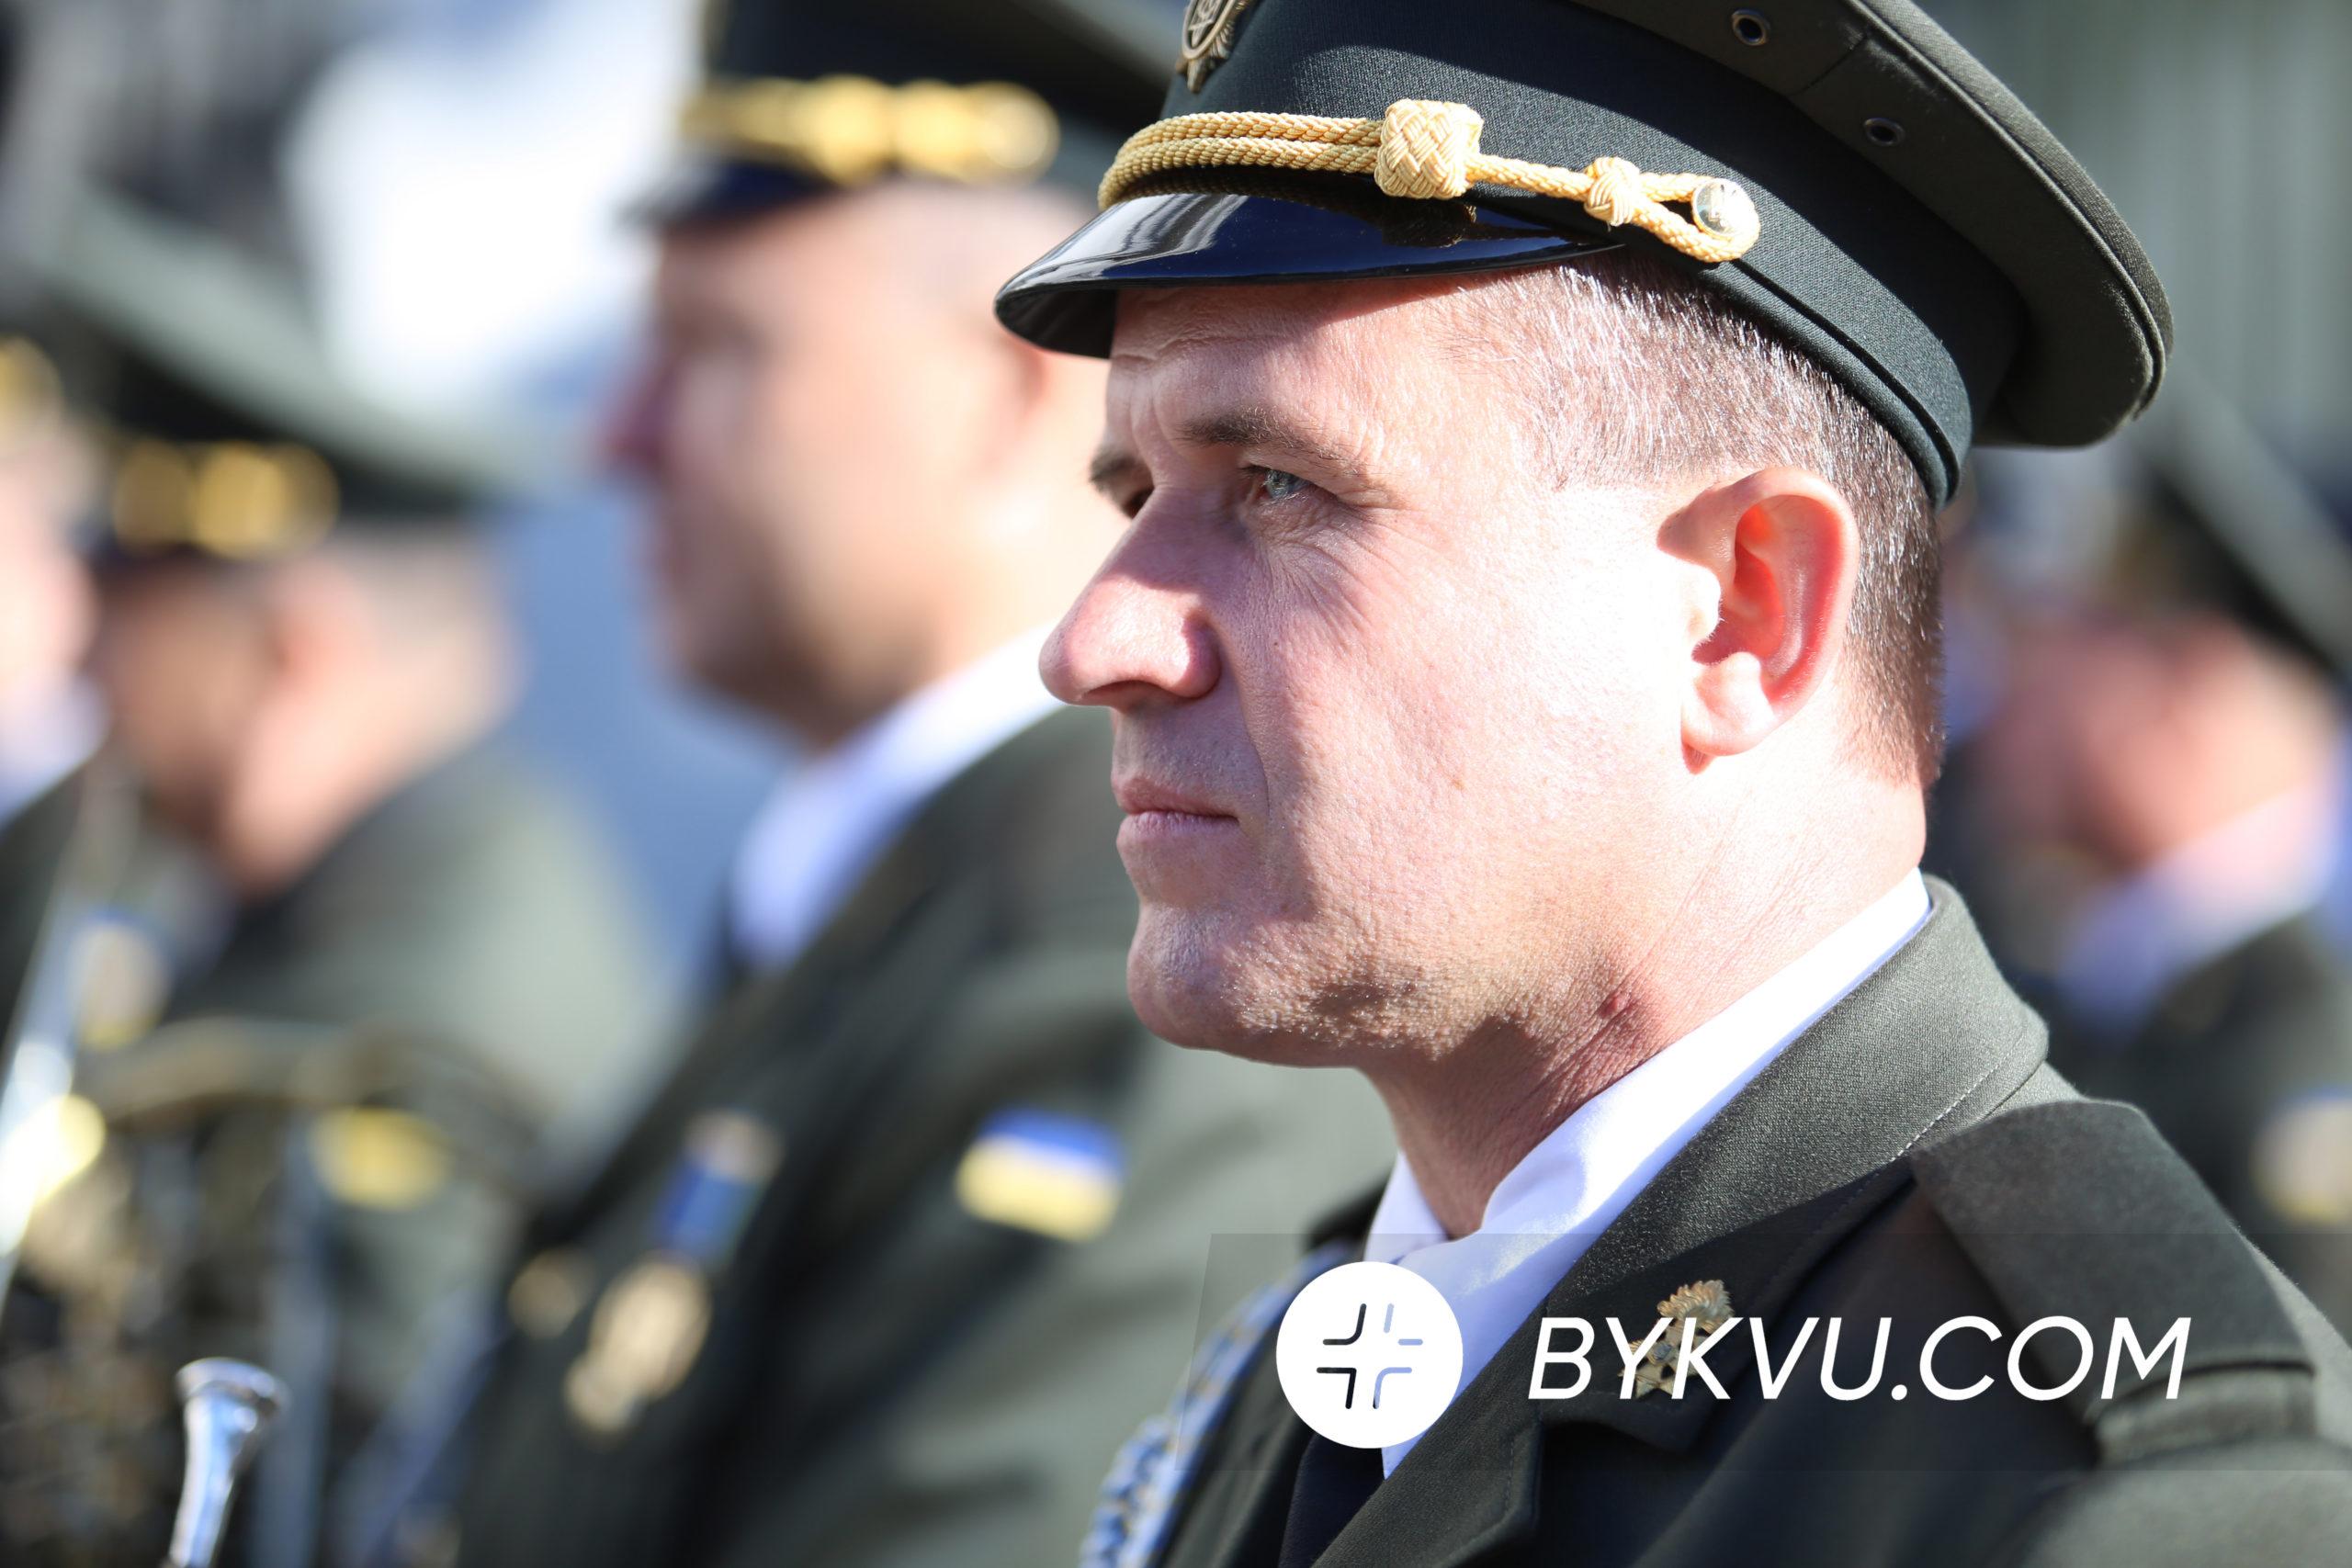 Верховная Рада_почесна варта_Державний суверенітет